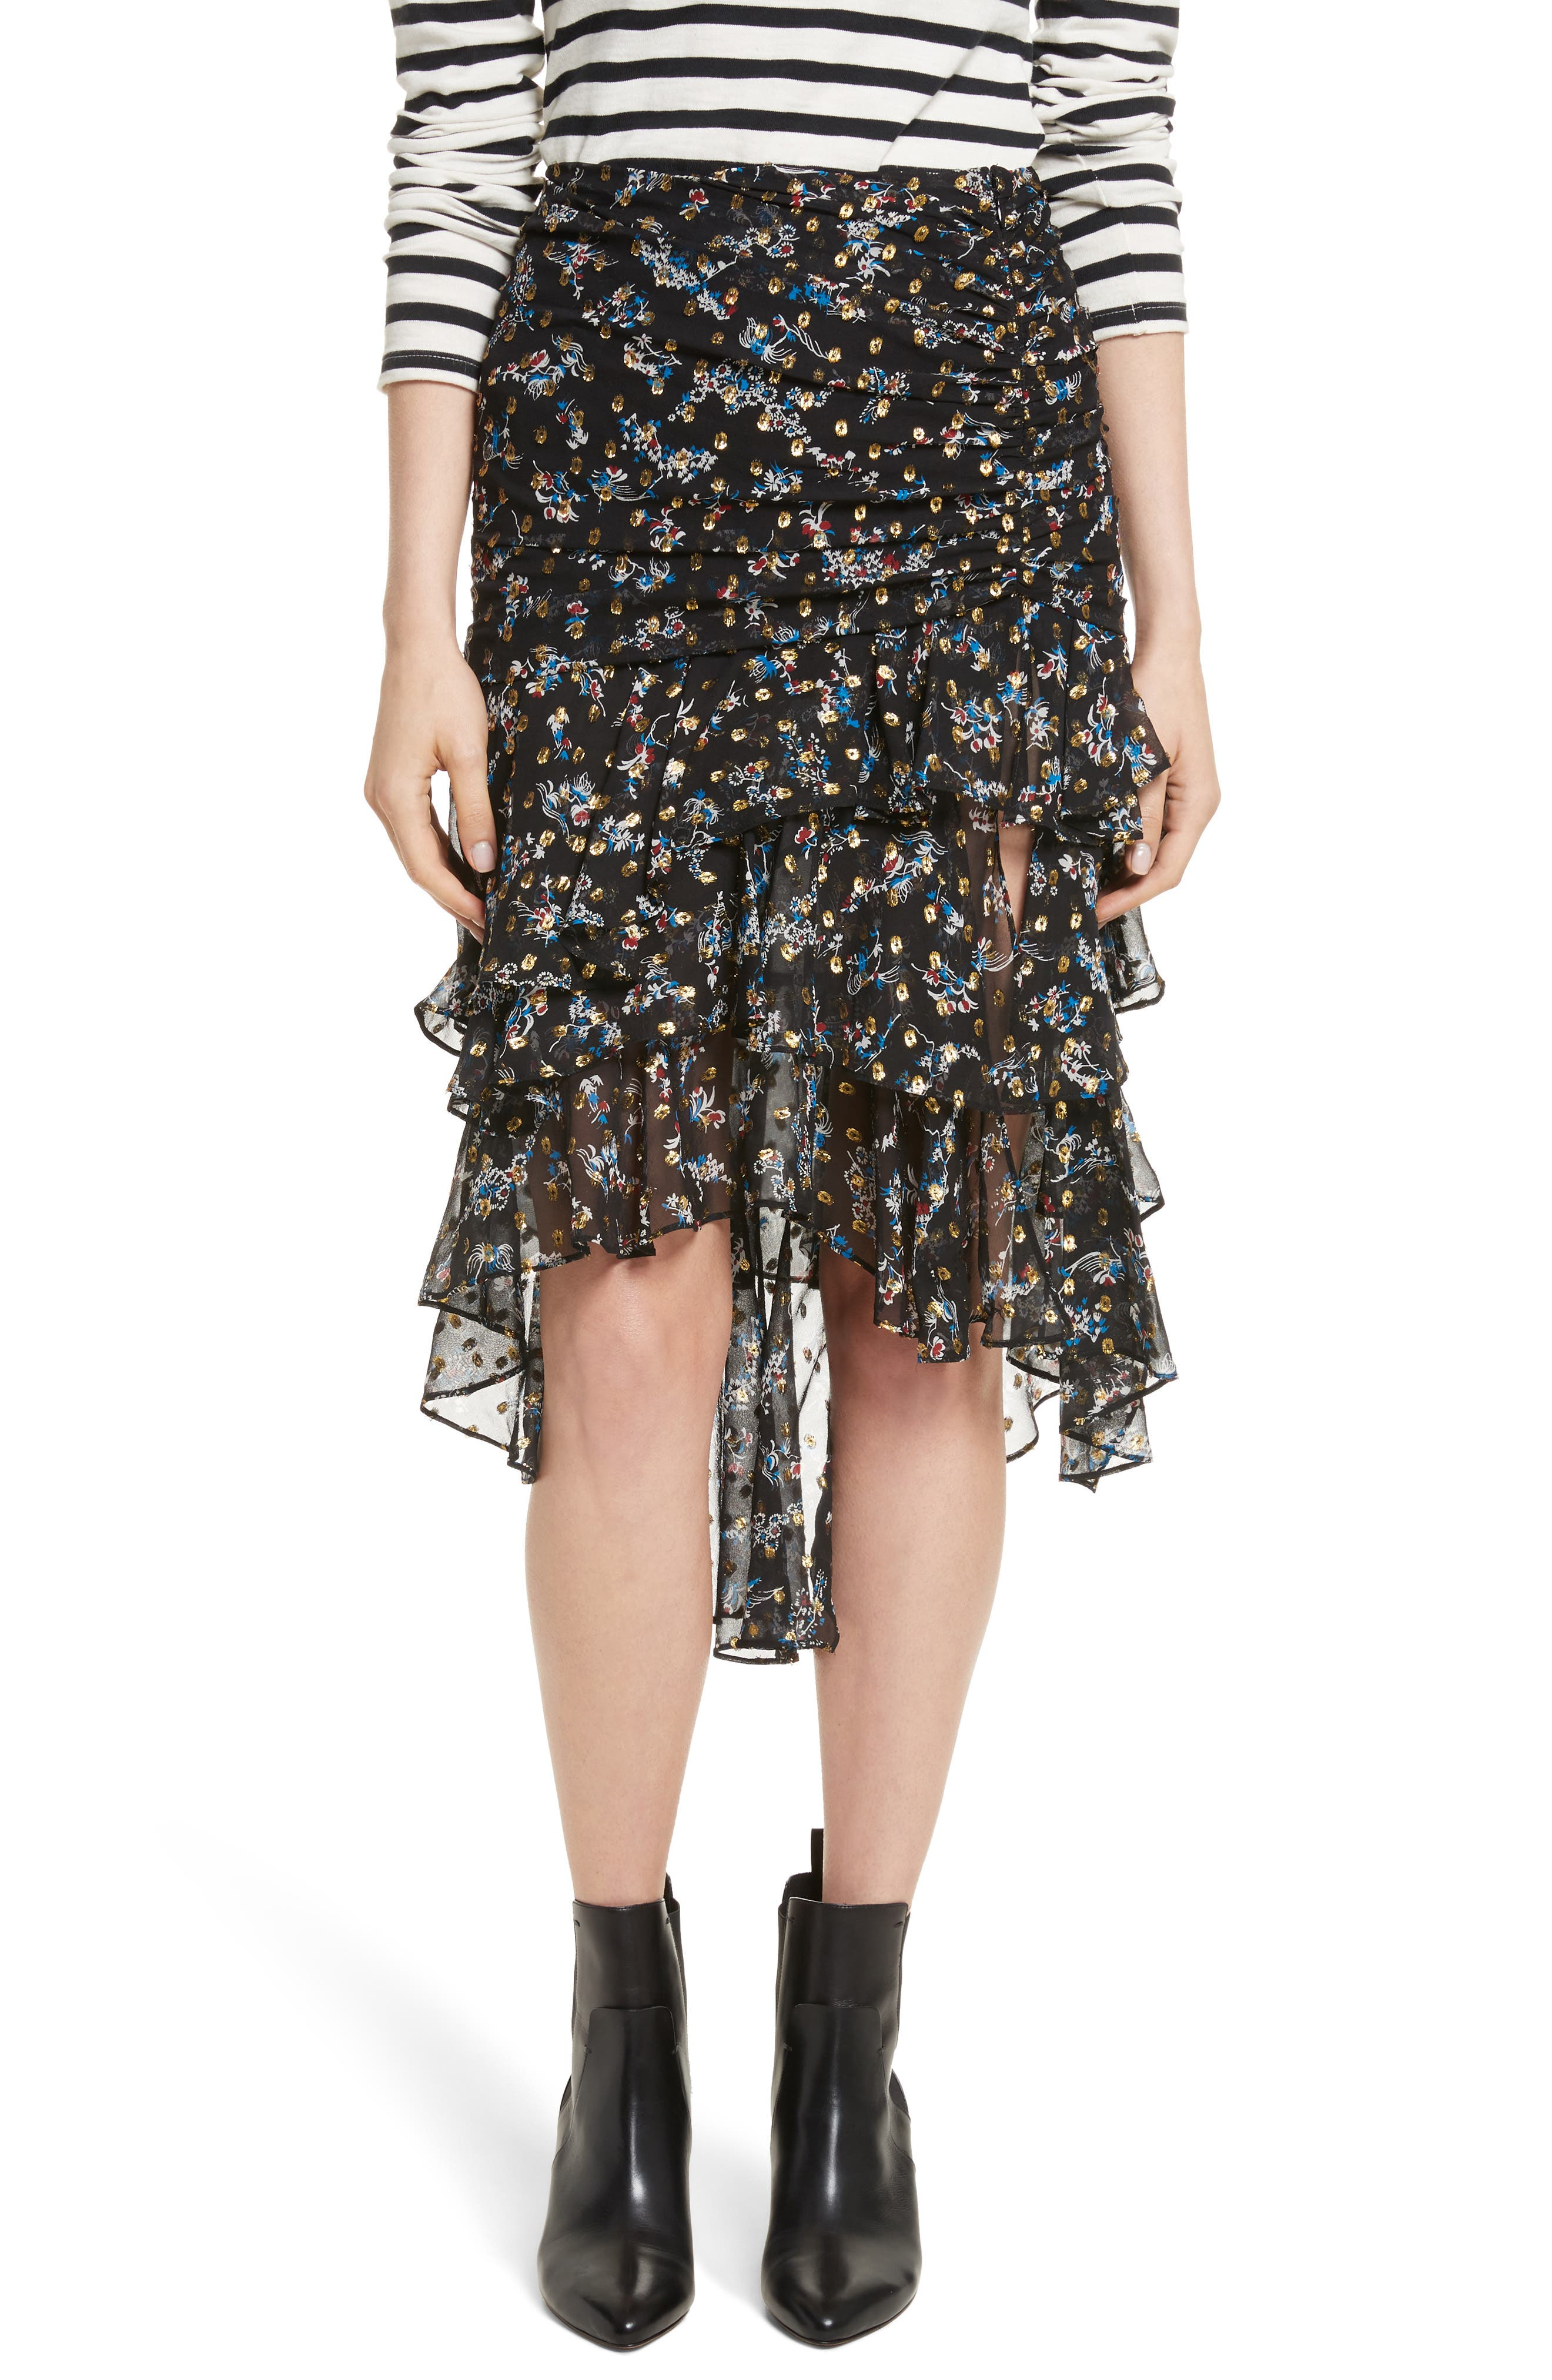 Alternate Image 1 Selected - Veronica Beard Cella Metallic Floral Print Midi Skirt